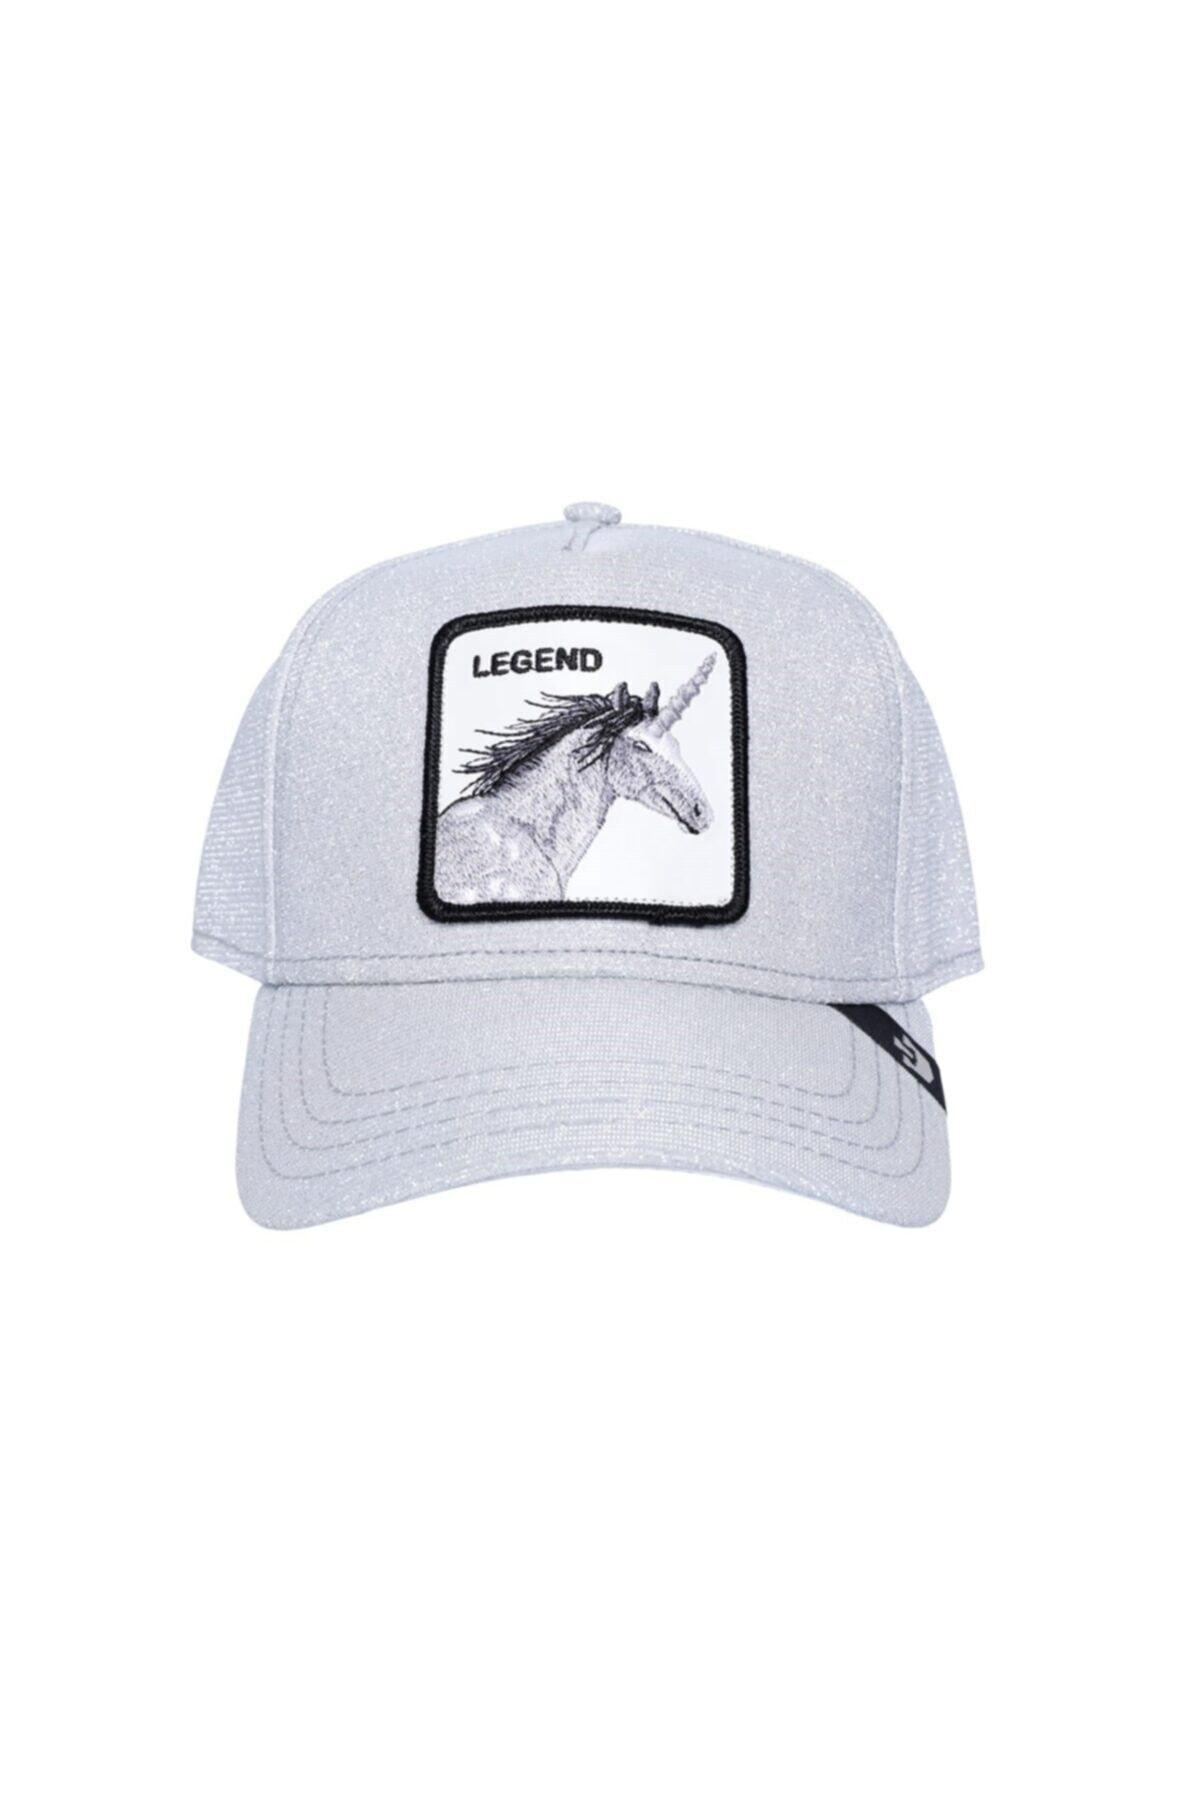 Goorin Bros Unisex Beyaz Believer Şapka 1